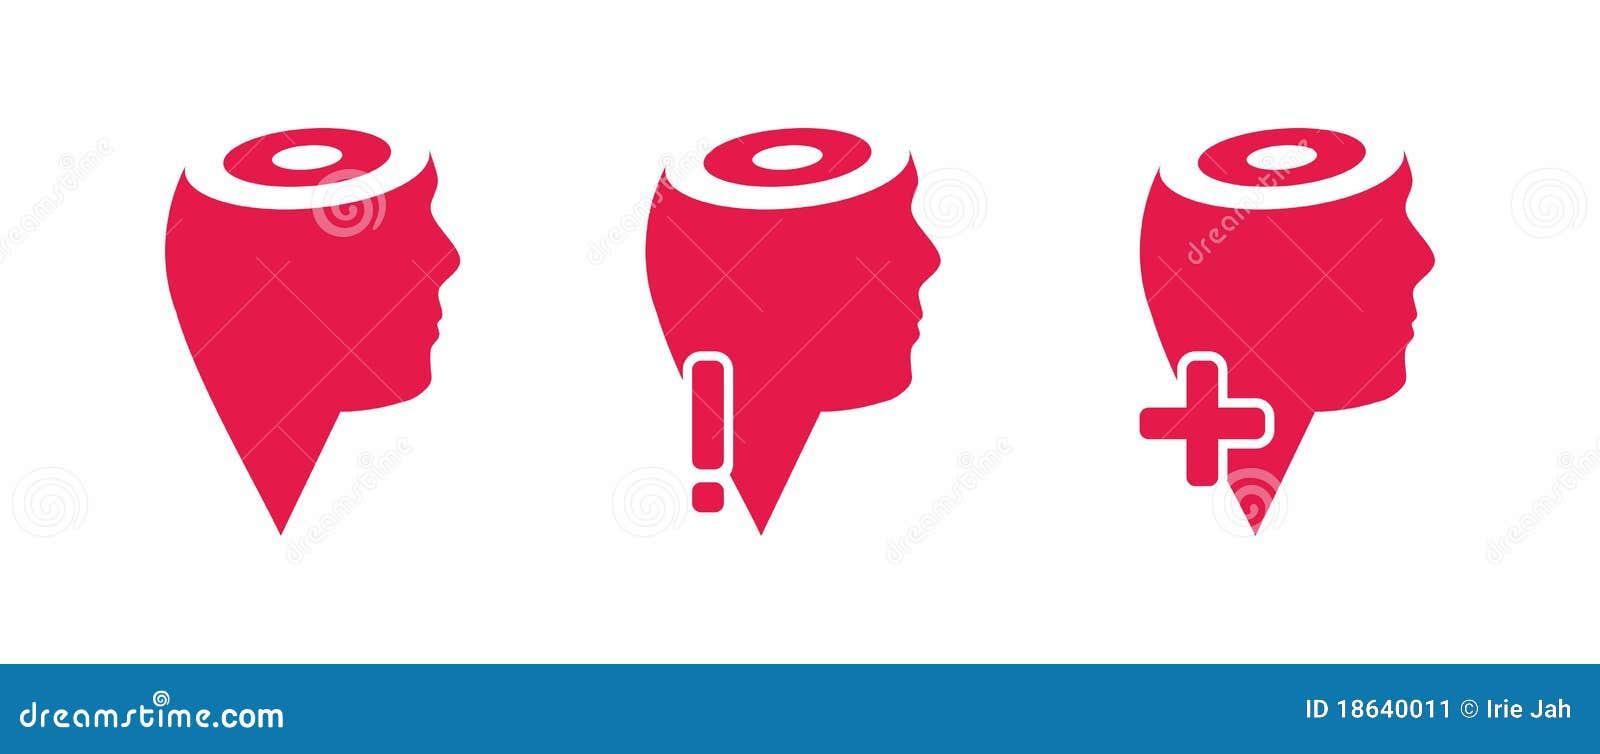 think heads